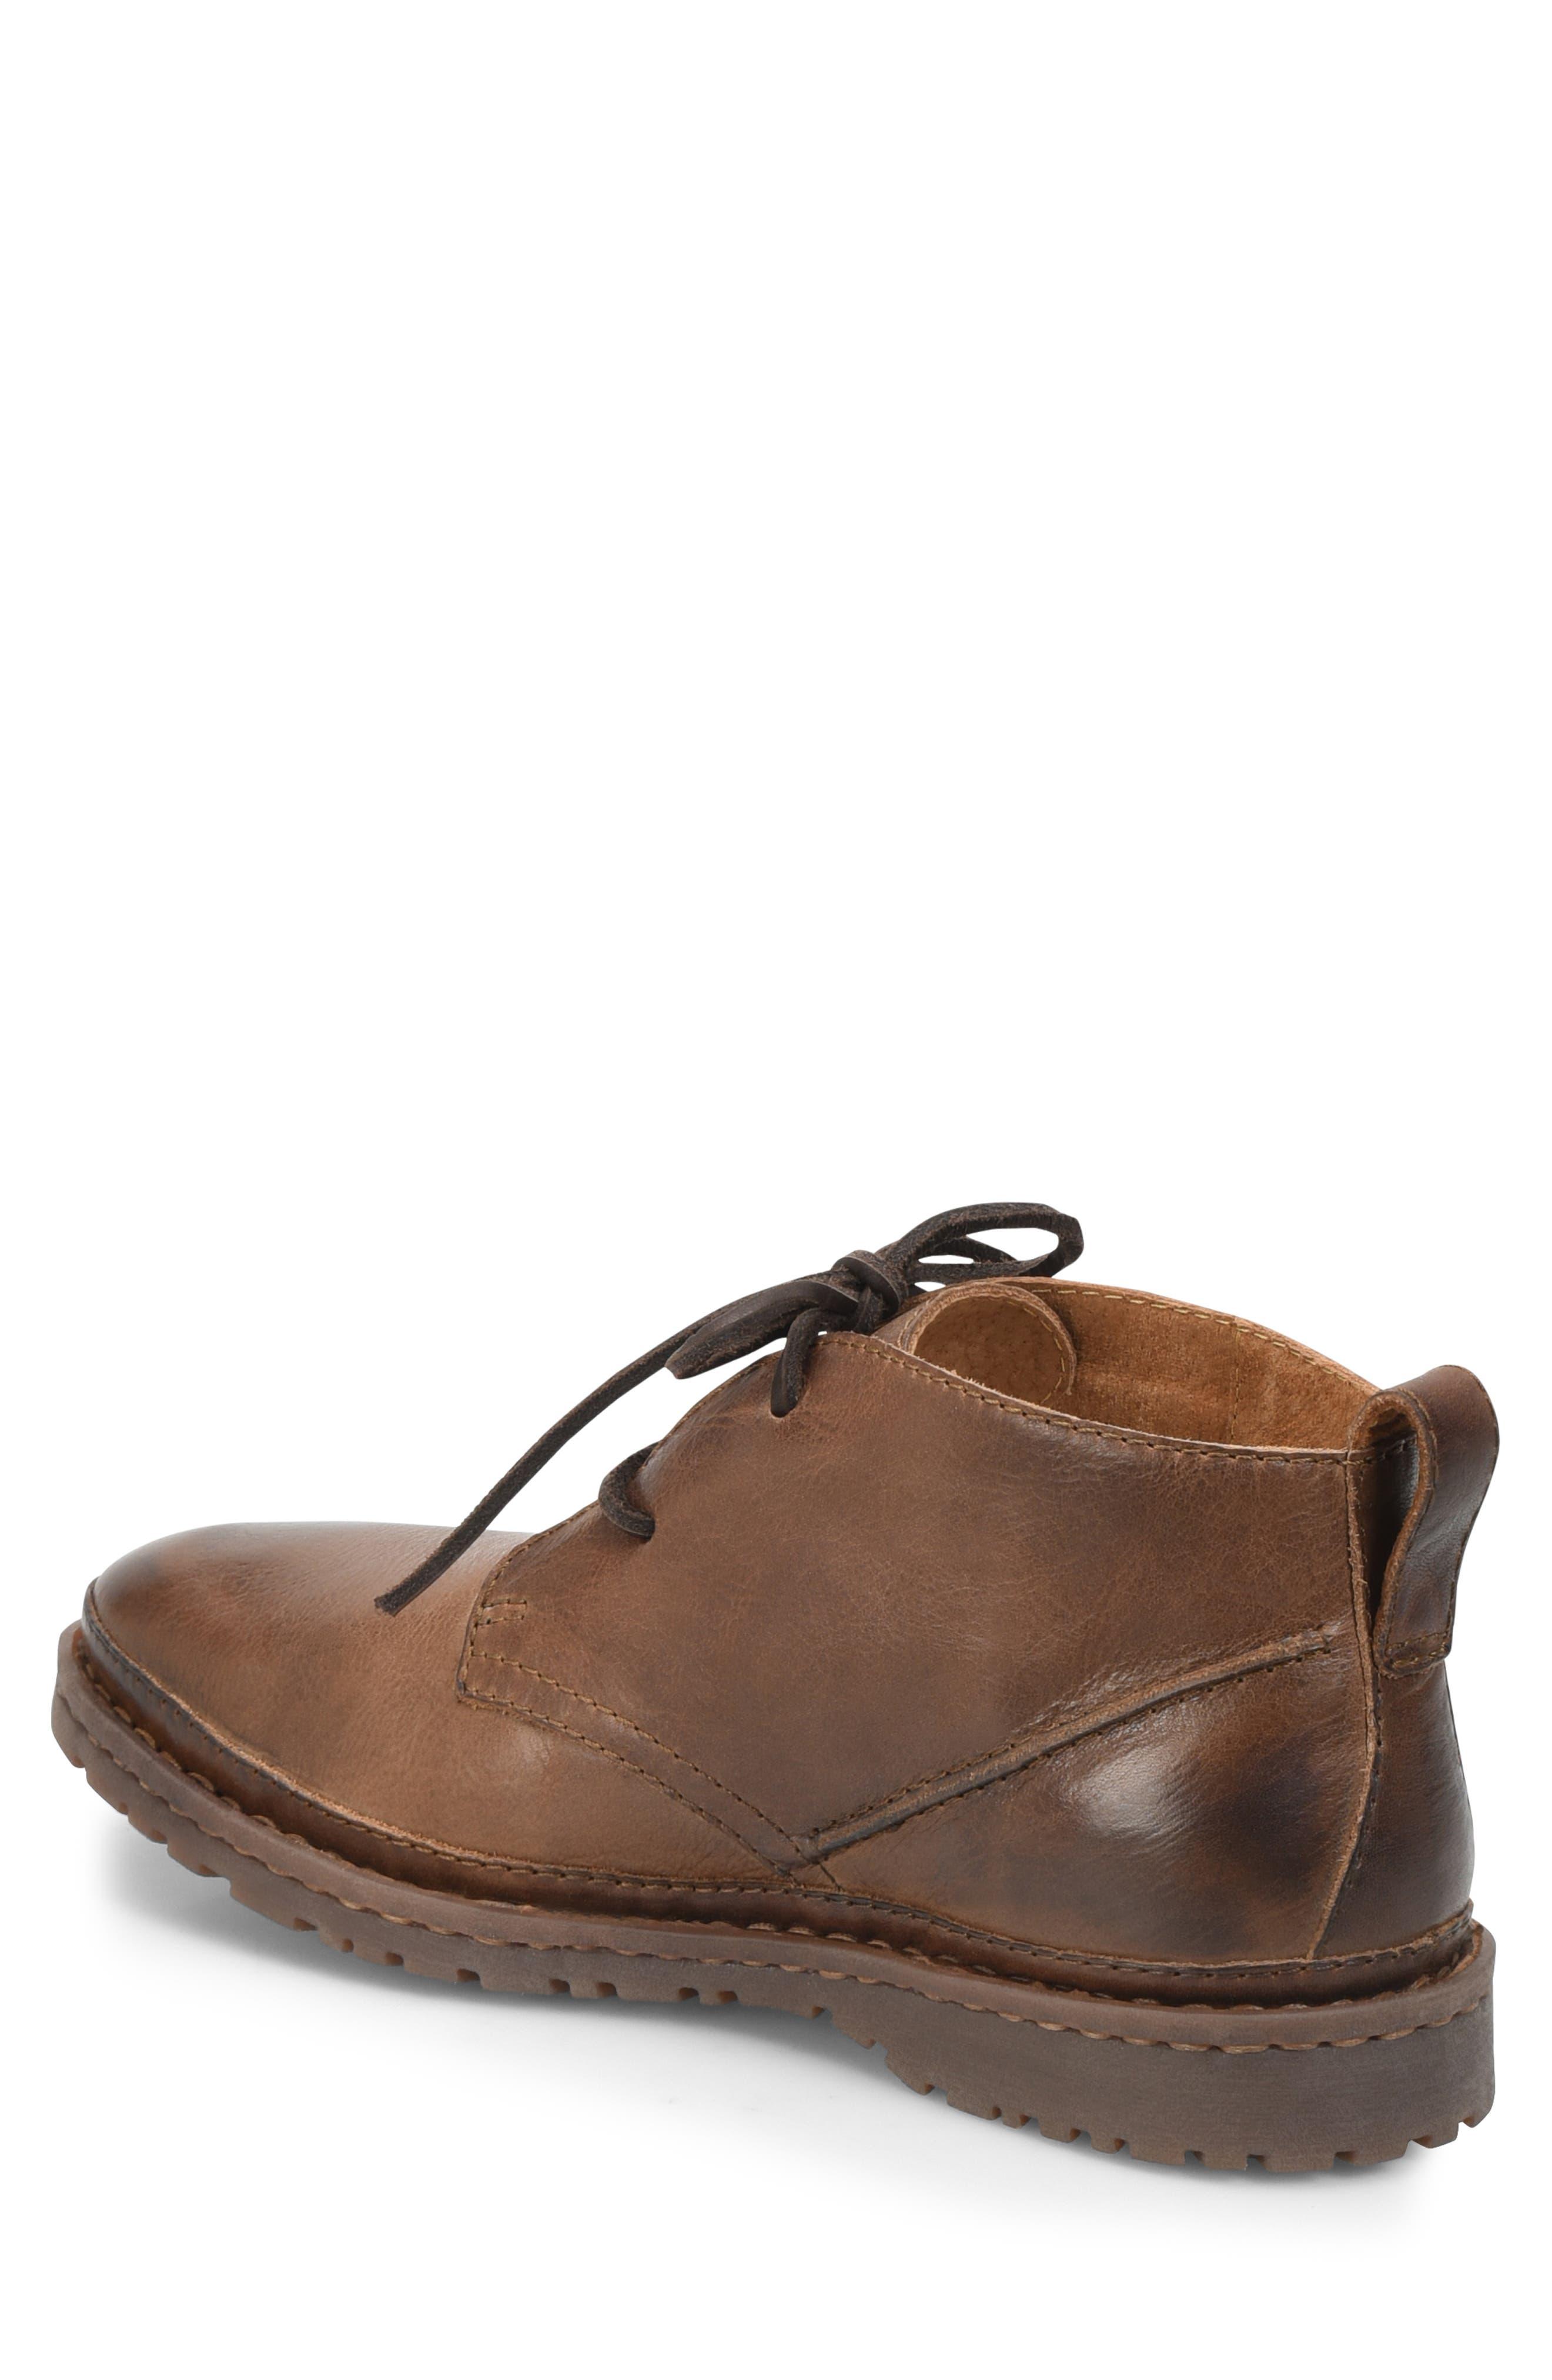 Elk II Chukka Boot,                             Alternate thumbnail 2, color,                             BROWN/BROWN LEATHER